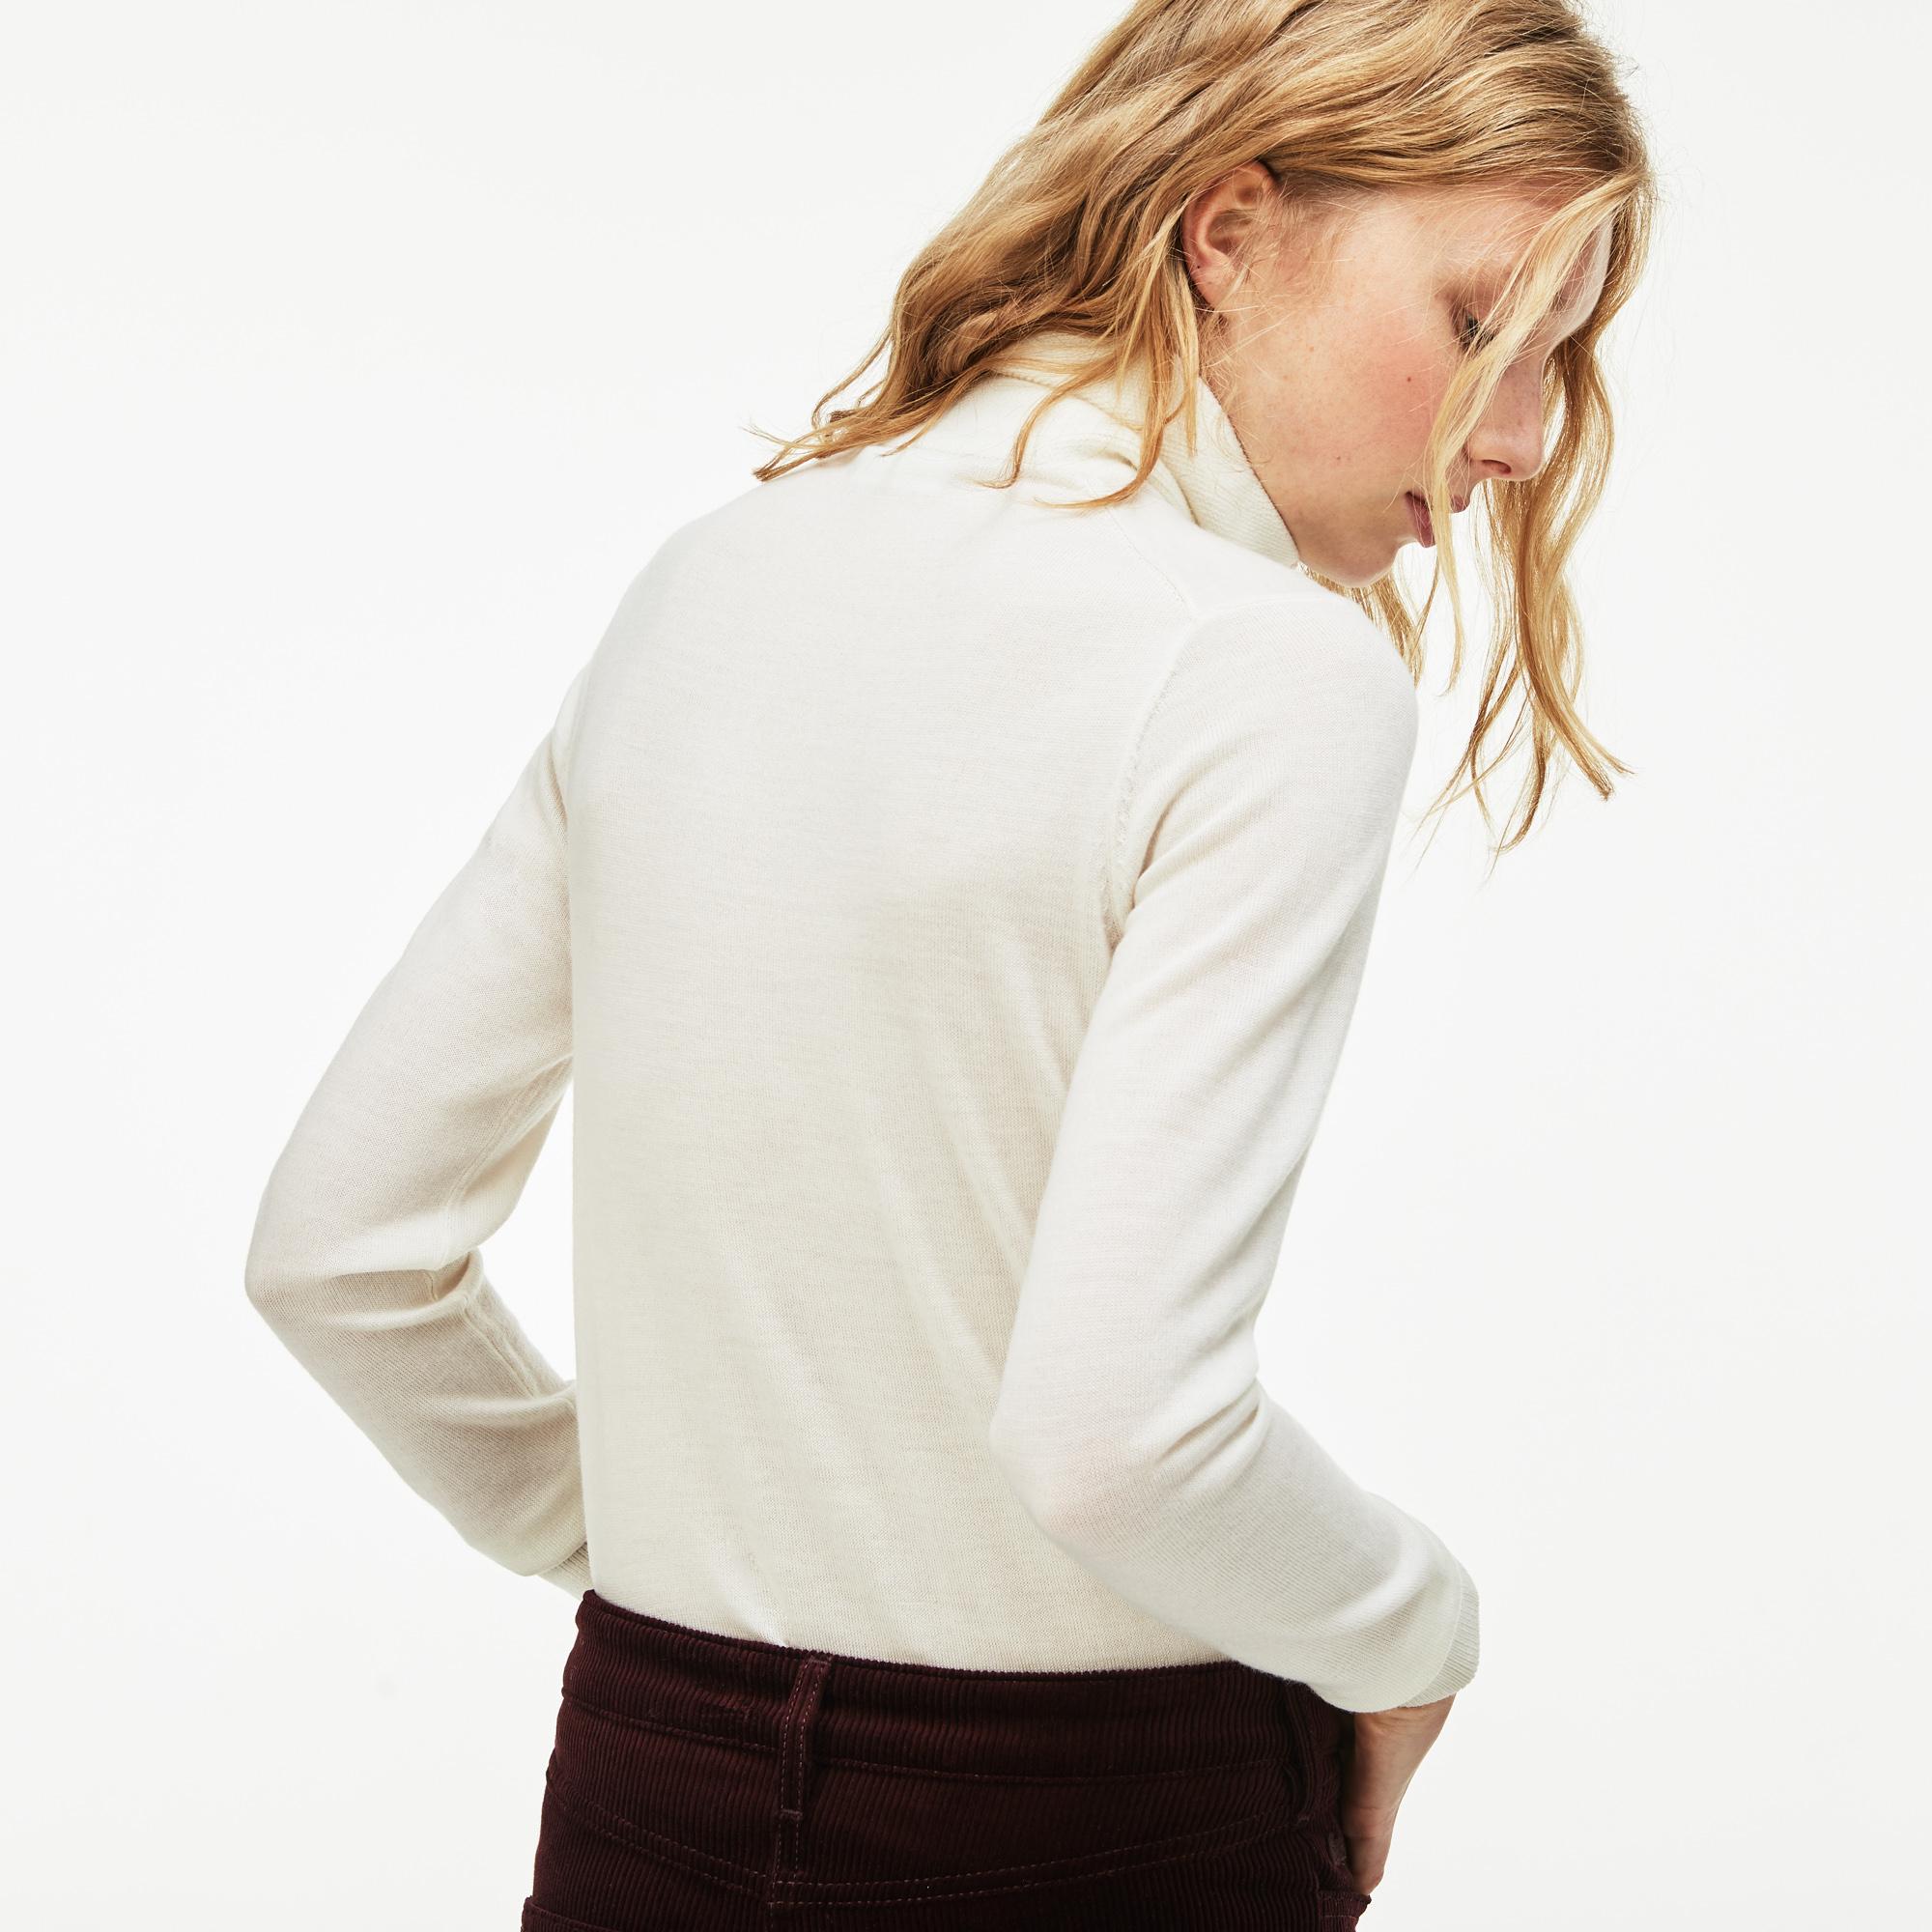 Фото 2 - Женский свитер Lacoste белого цвета